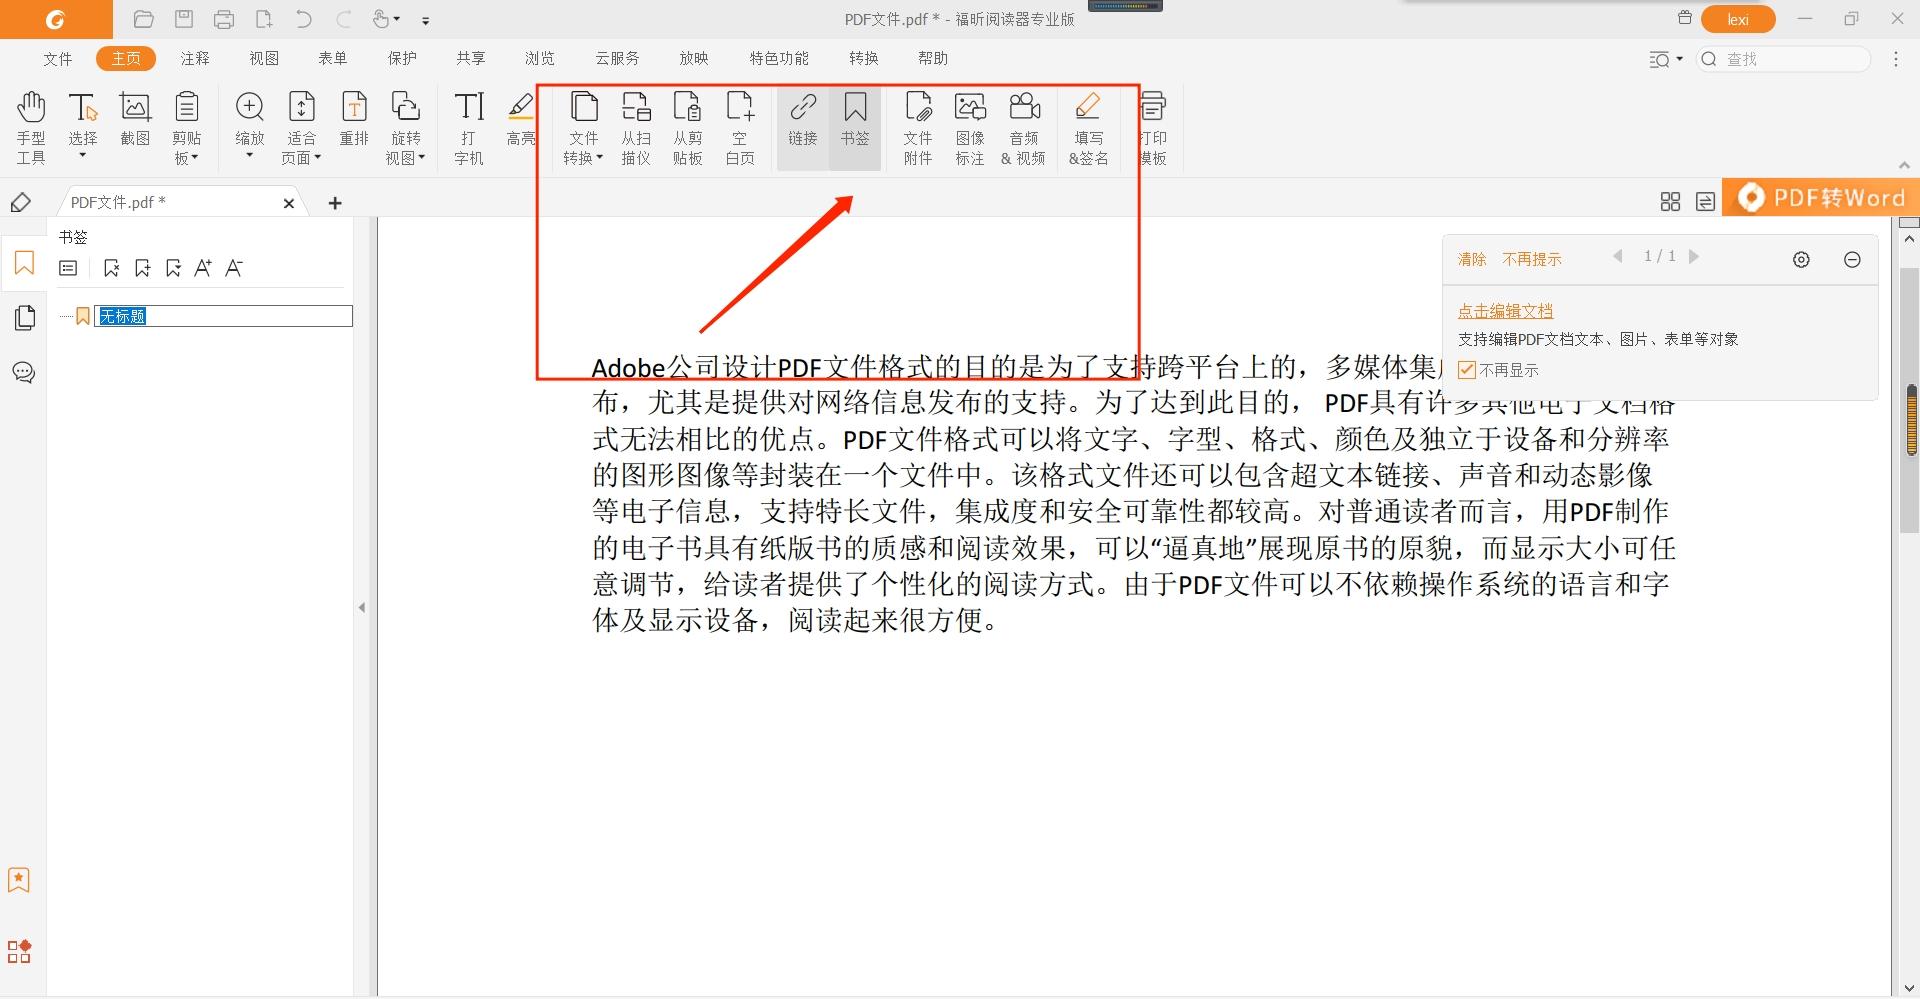 PDF添加书签